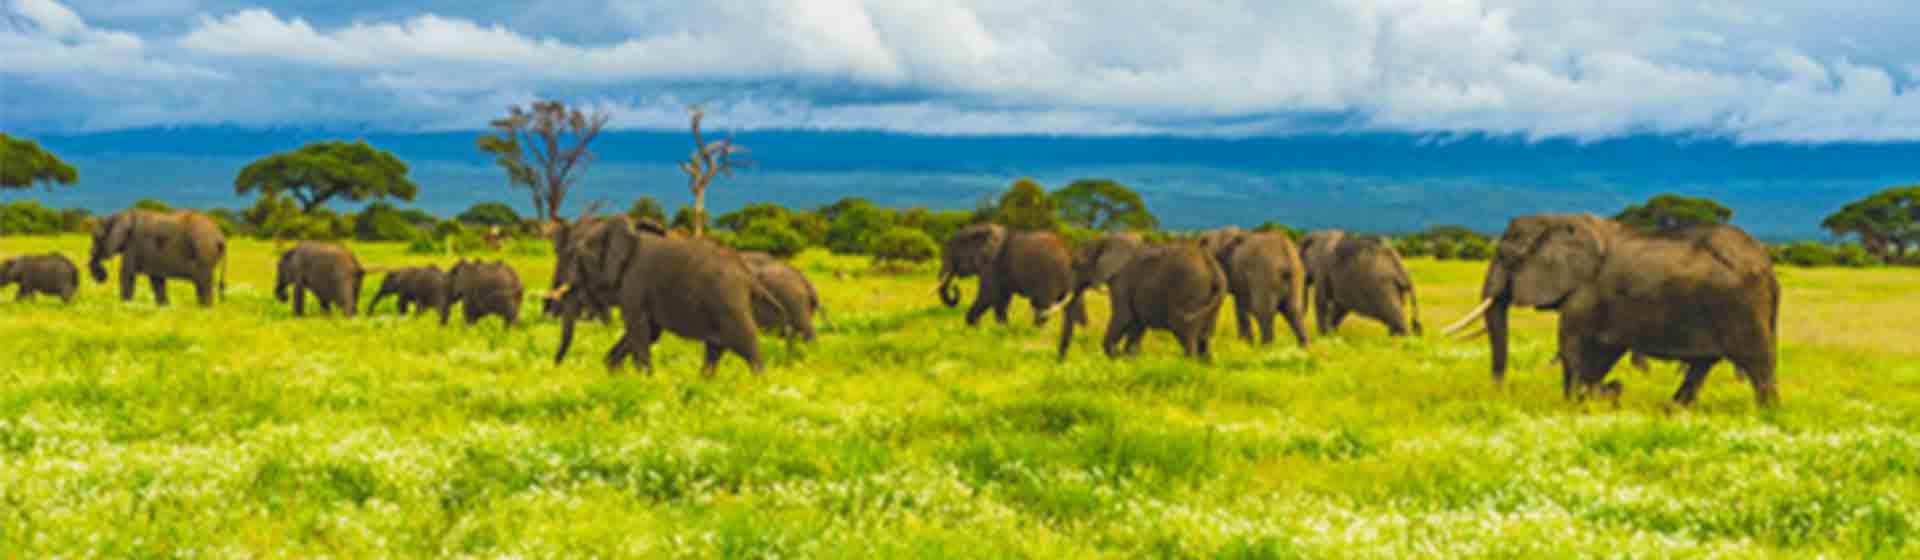 complete East Africa safari | 20 days Wildlife safari in East Africa |Asili Adventure Safaris